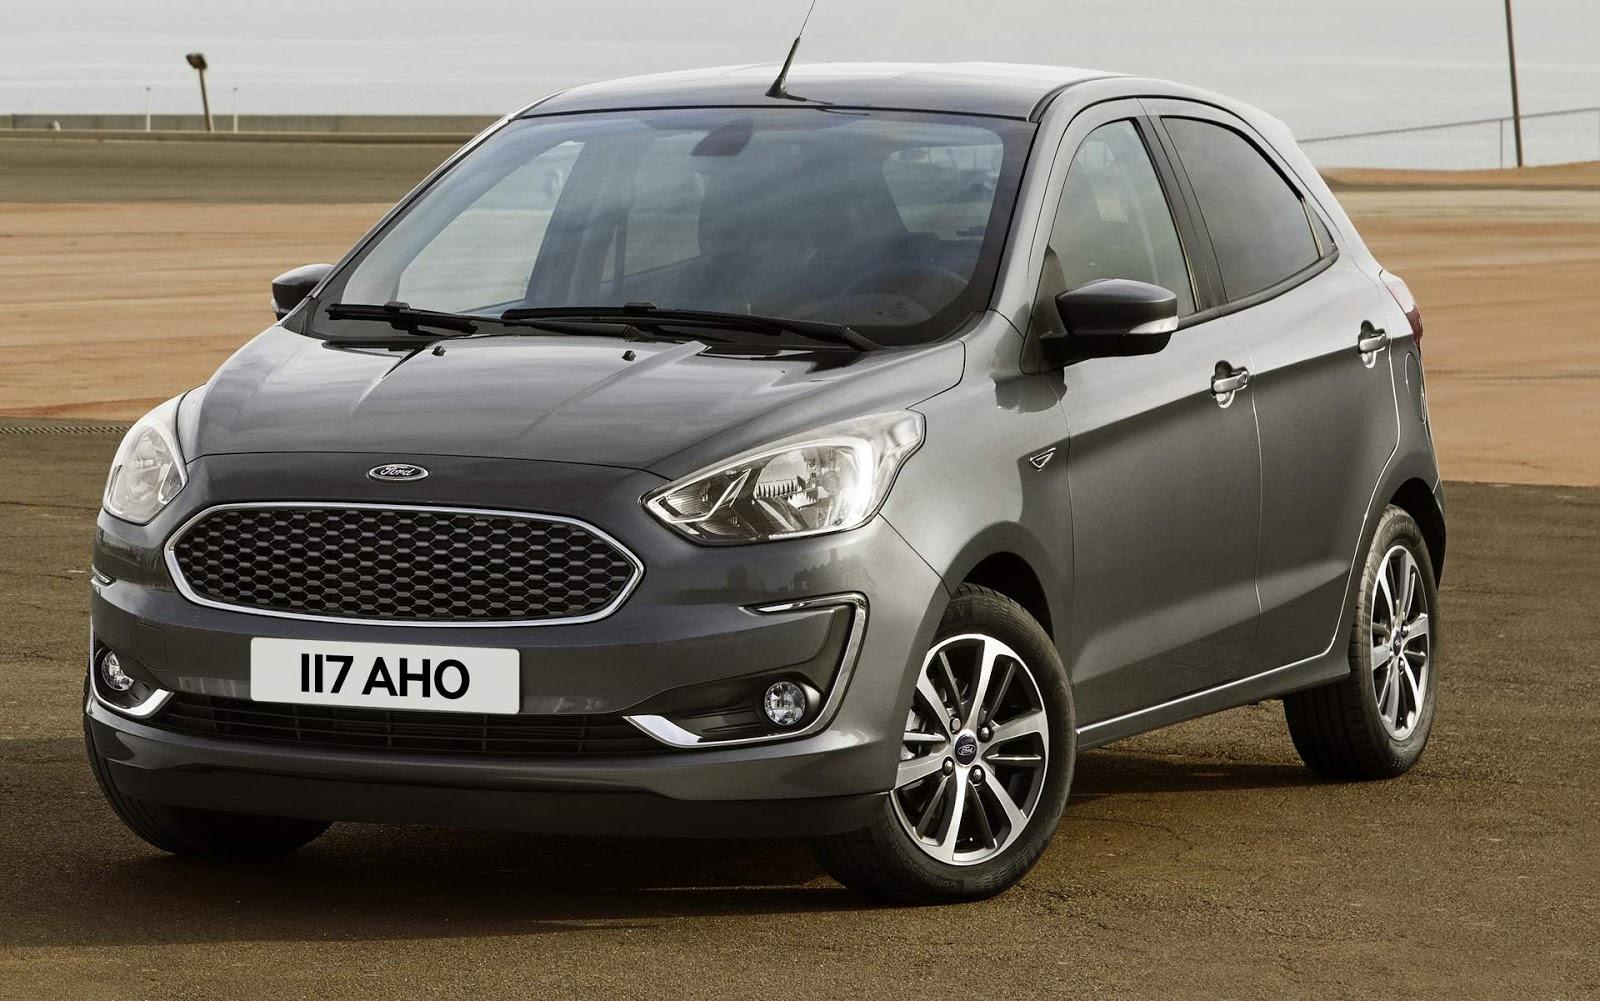 novo ford ka  facelift revelado  nova versao disponivel motor vicio